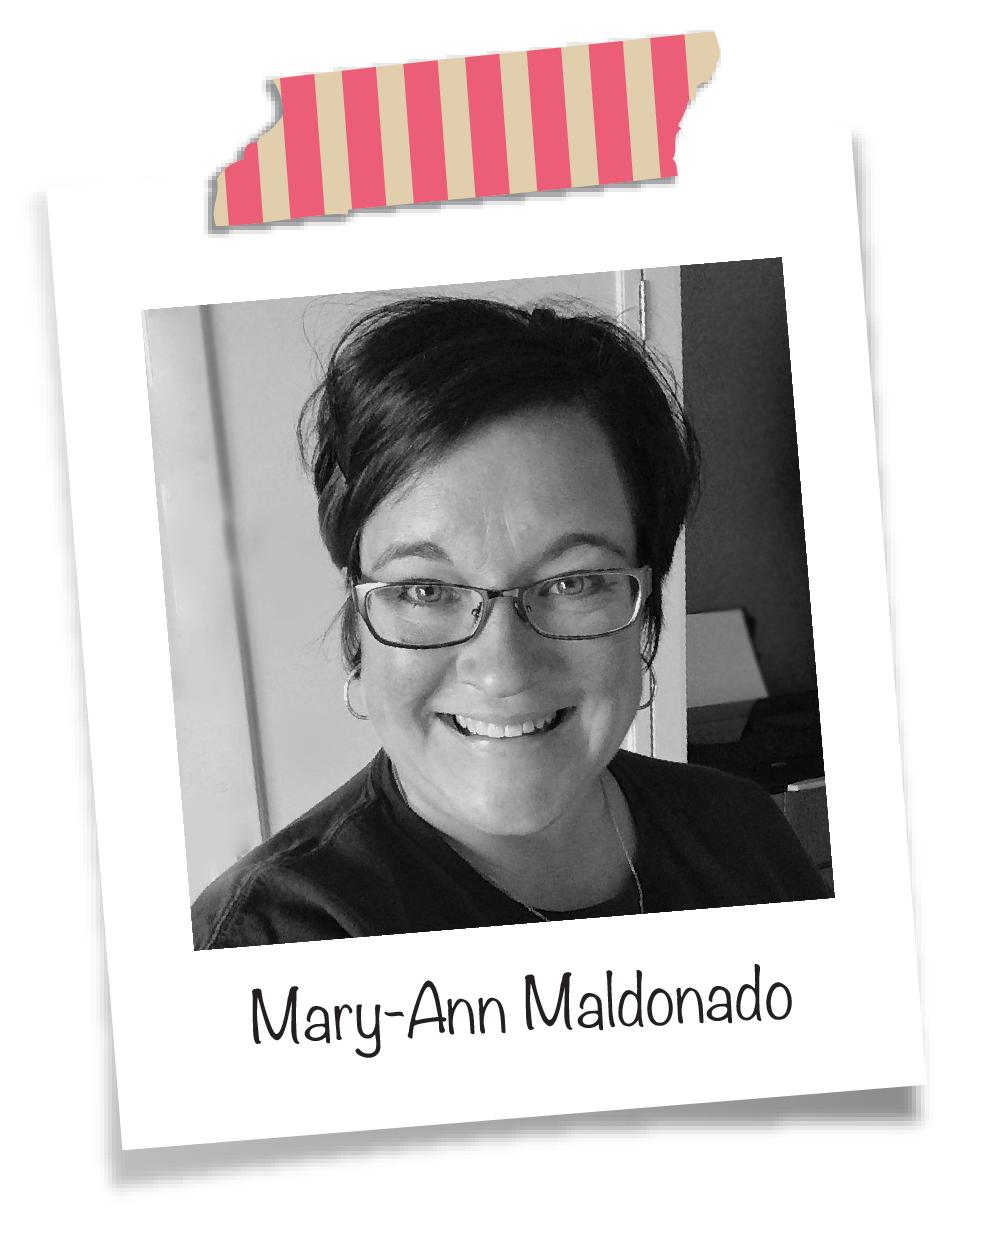 mambi Design Team member Mary-Ann Maldonado